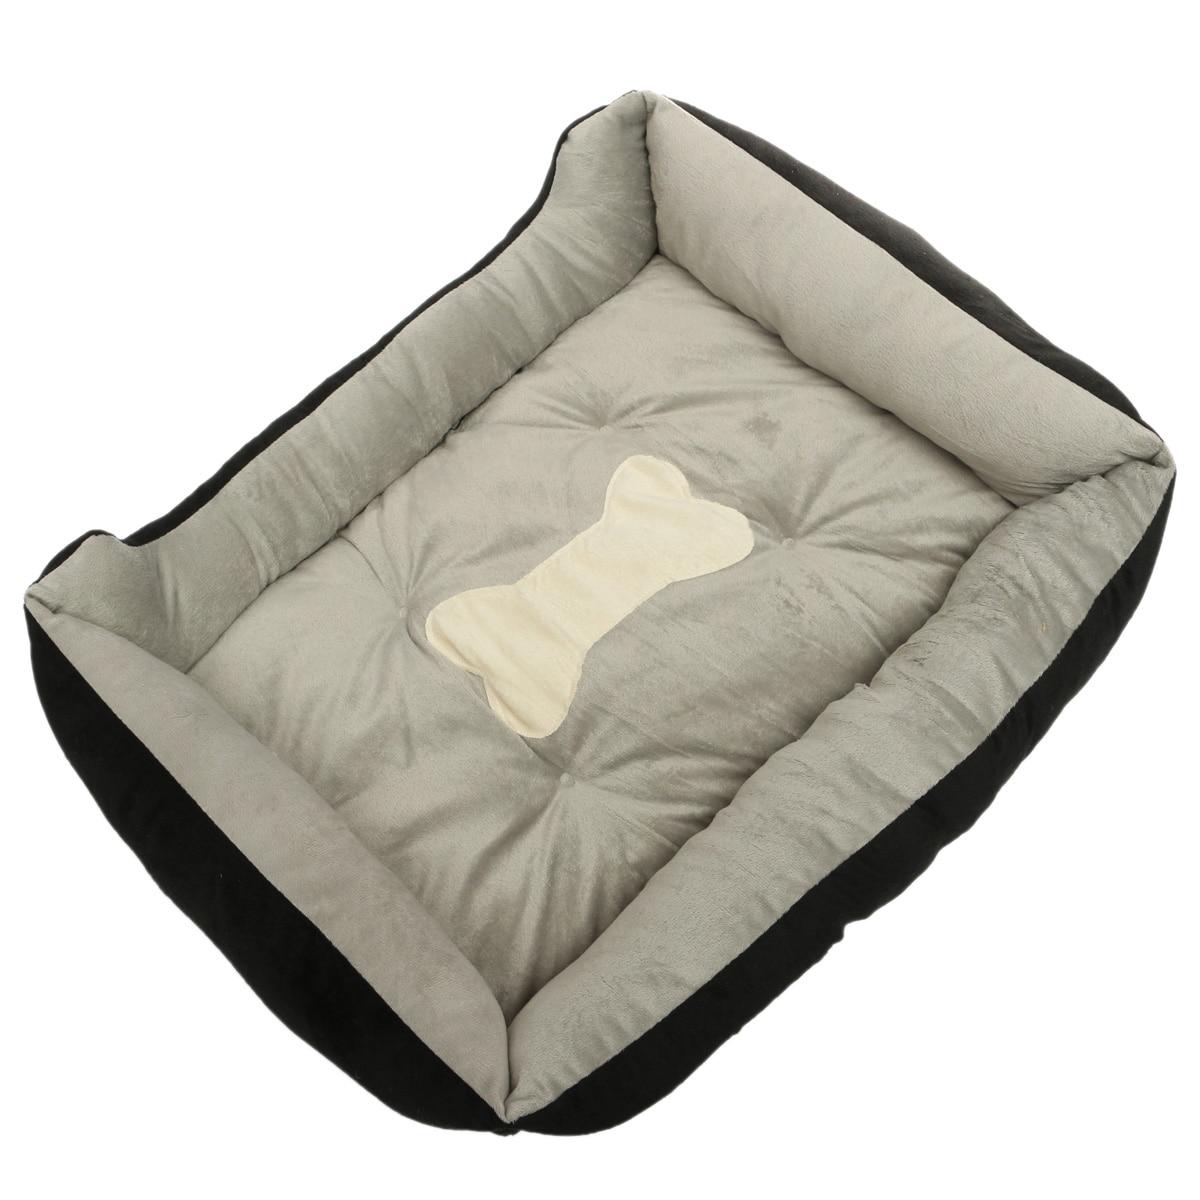 Bed For Dogs Warm Flannel Warm Waterproof Bottom Soft Fleece Warm Cat House Petshop Puppy Mats Kennel Play Rest Sleep Cushion 14